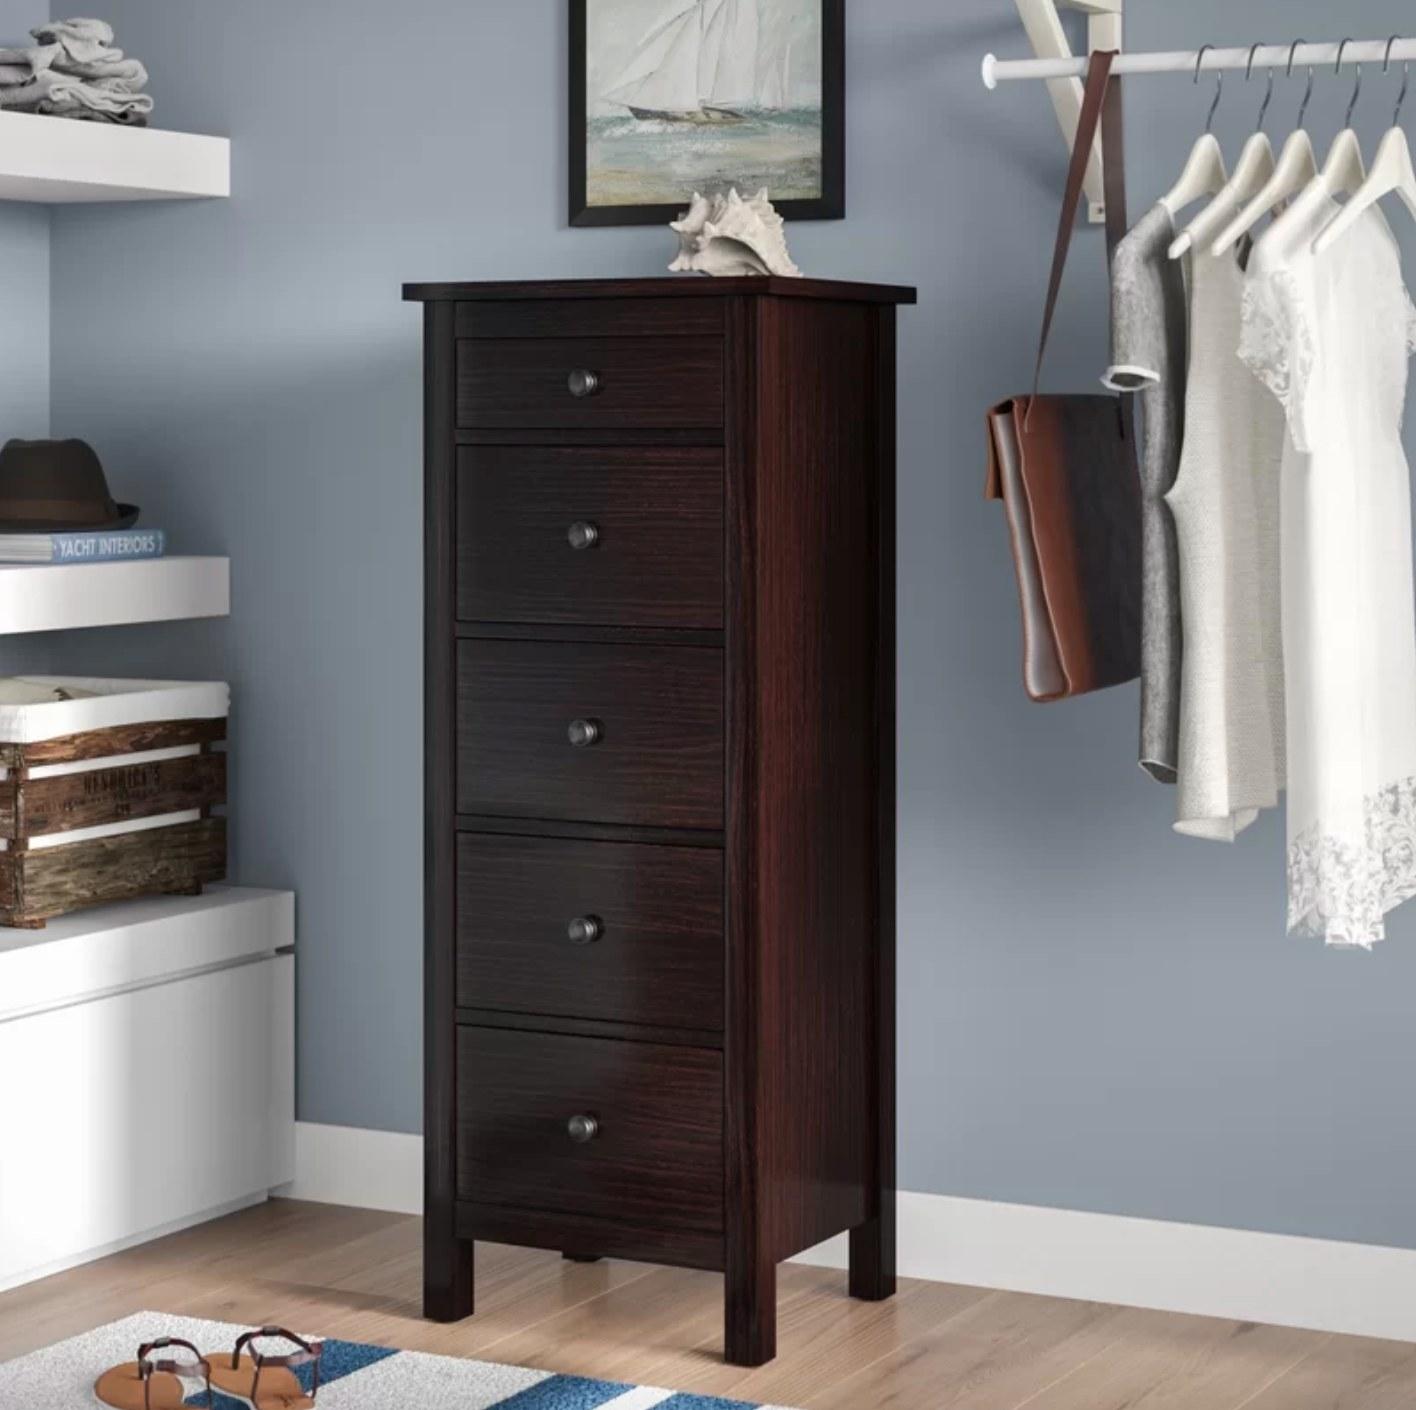 The five-drawer lingerie dresser in espresso